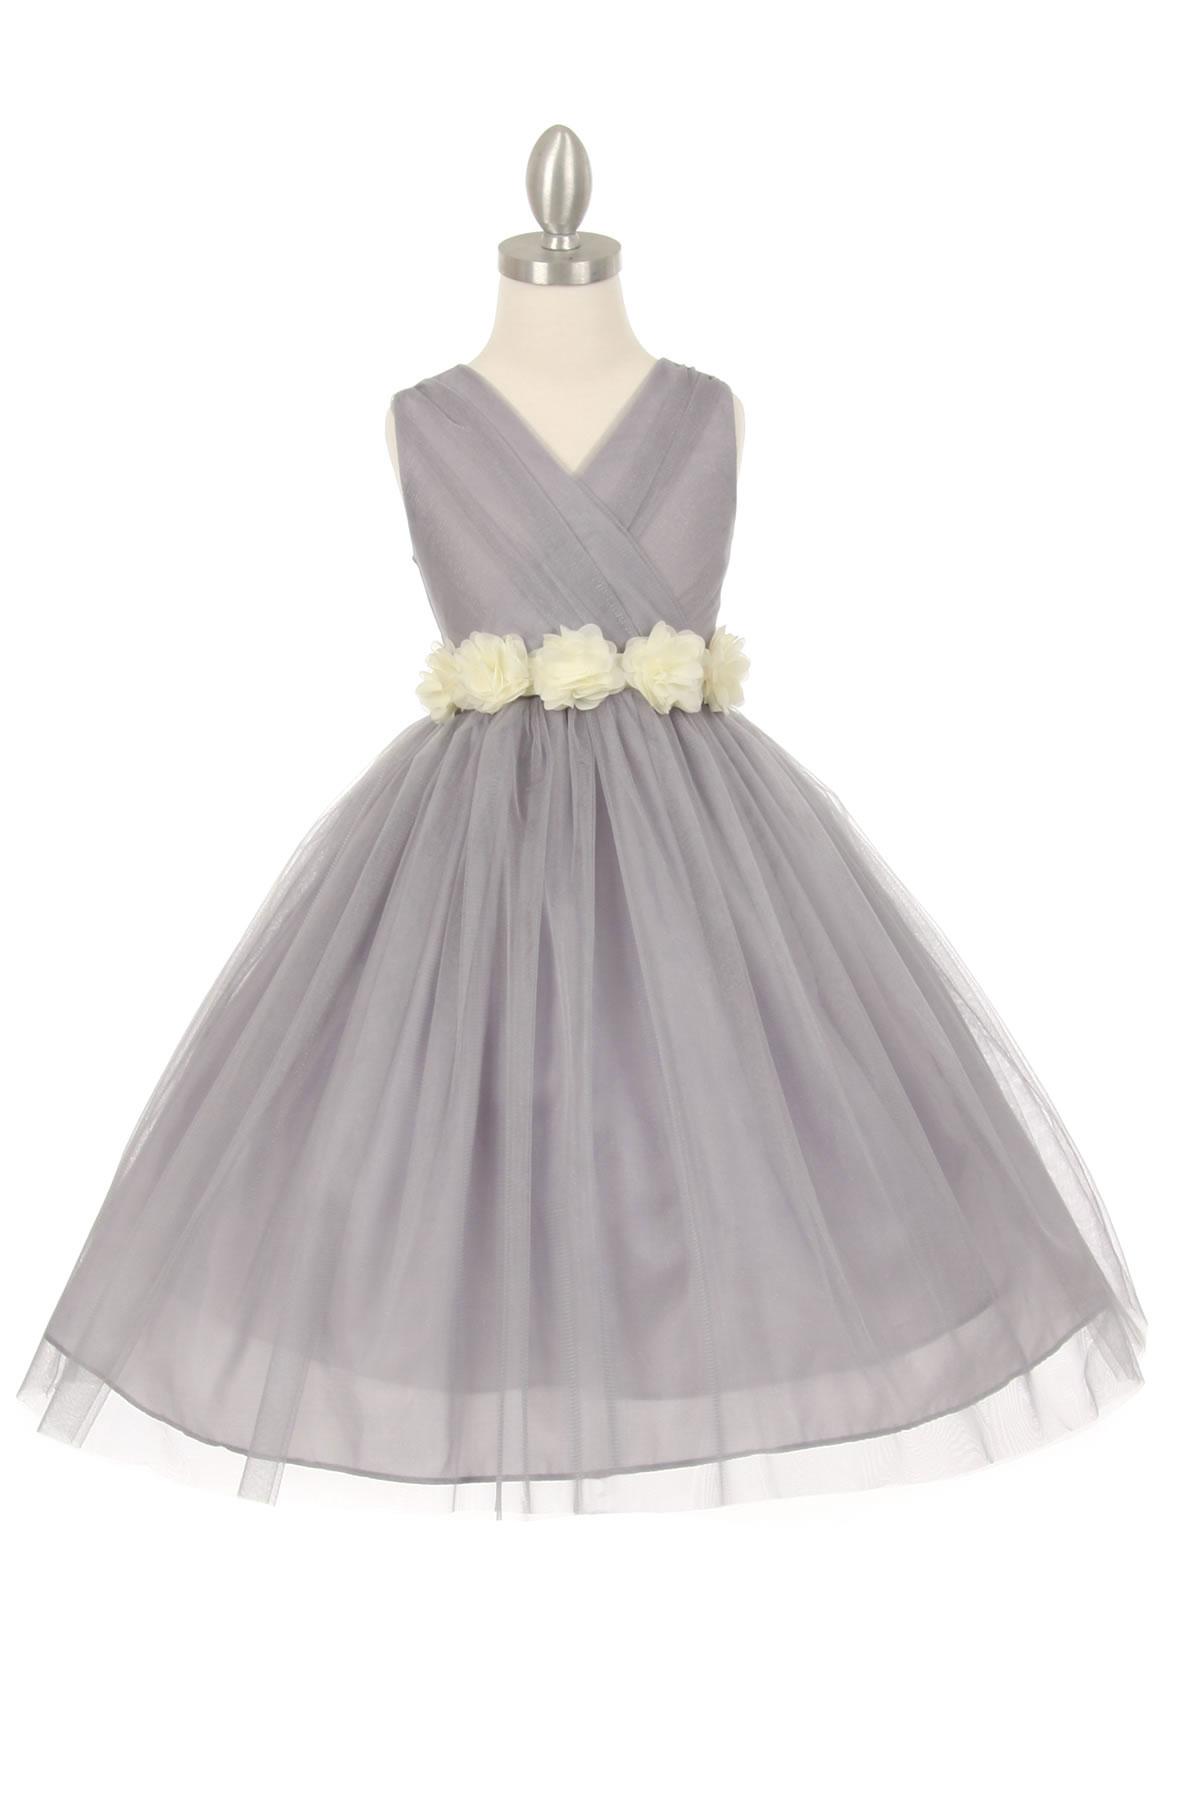 CC 1220SVIV Girls Dress Style 1220 SILVER Dress with 14 Sash Options Se